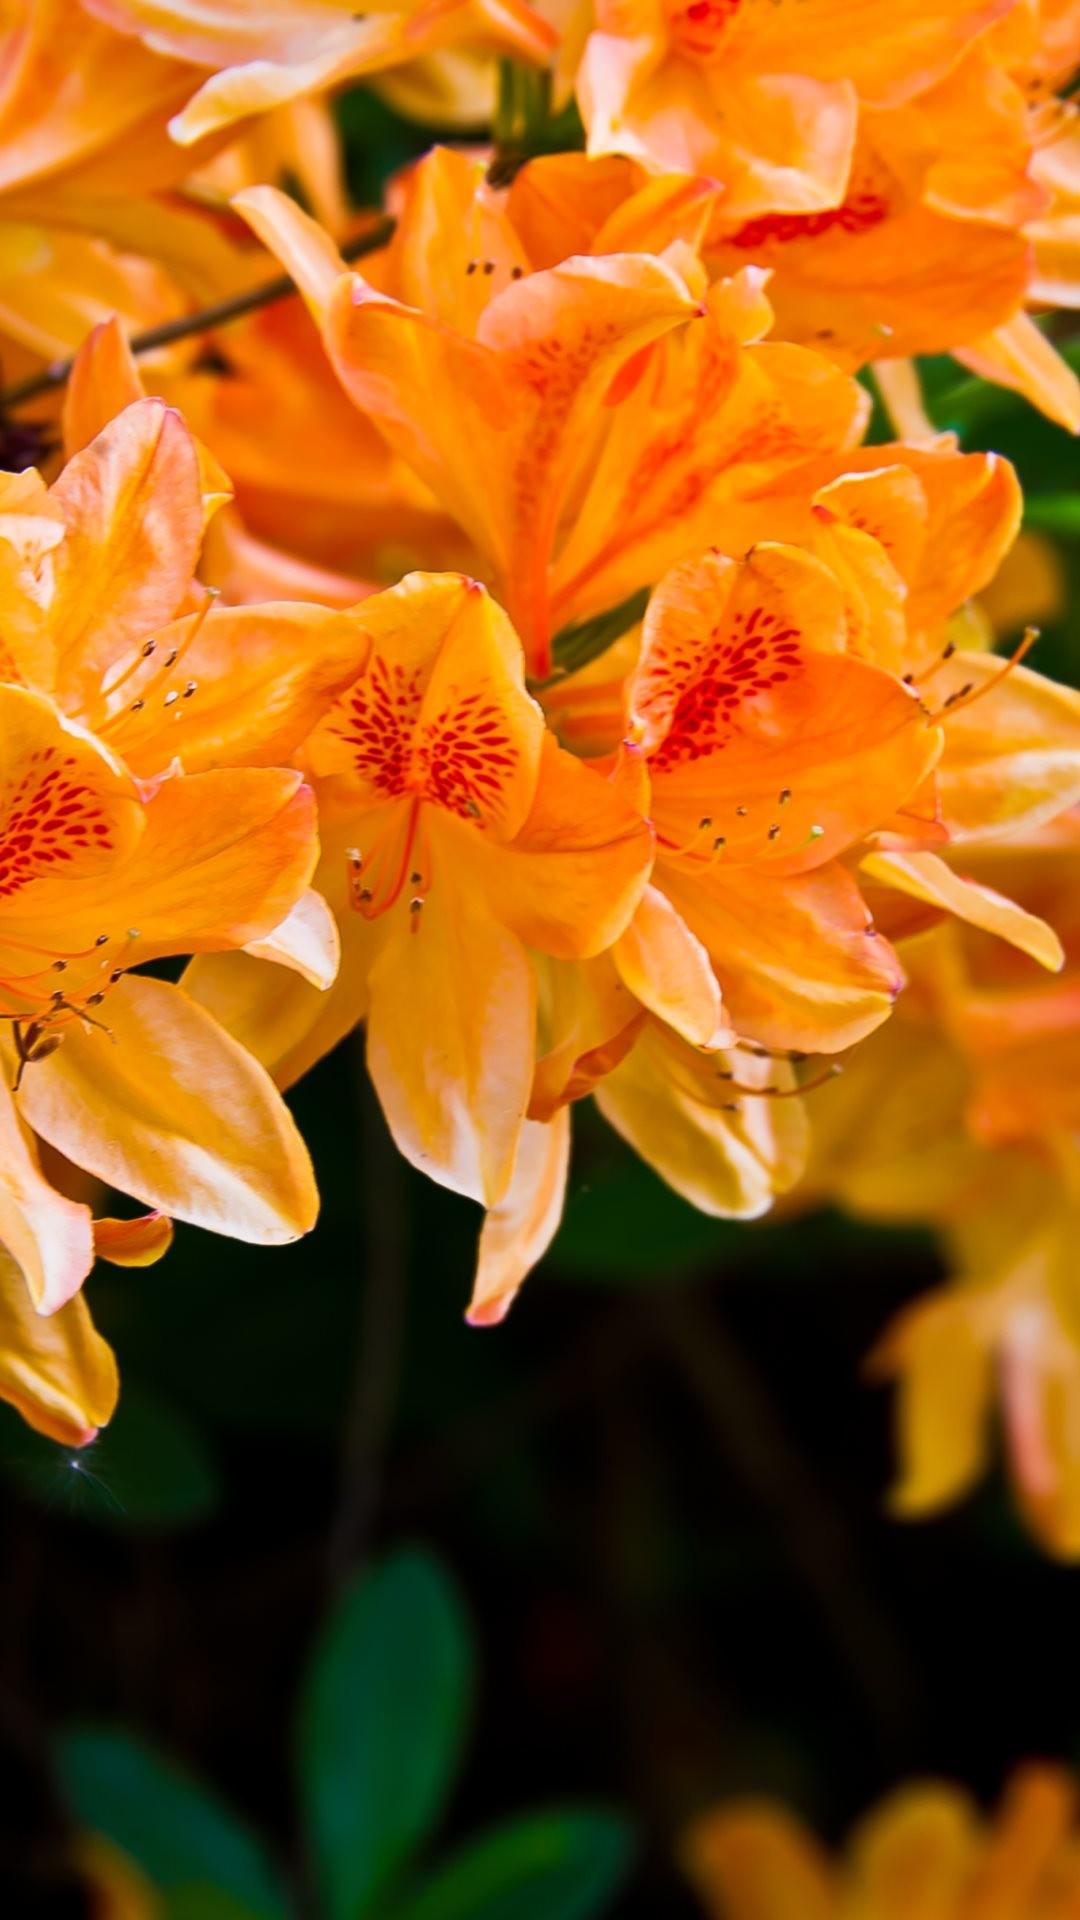 Light Orange Flowers Iphone 6 Plus Hd Wallpaper Orange Flower Wallpaper Iphone 357357 Hd Wallpaper Backgrounds Download